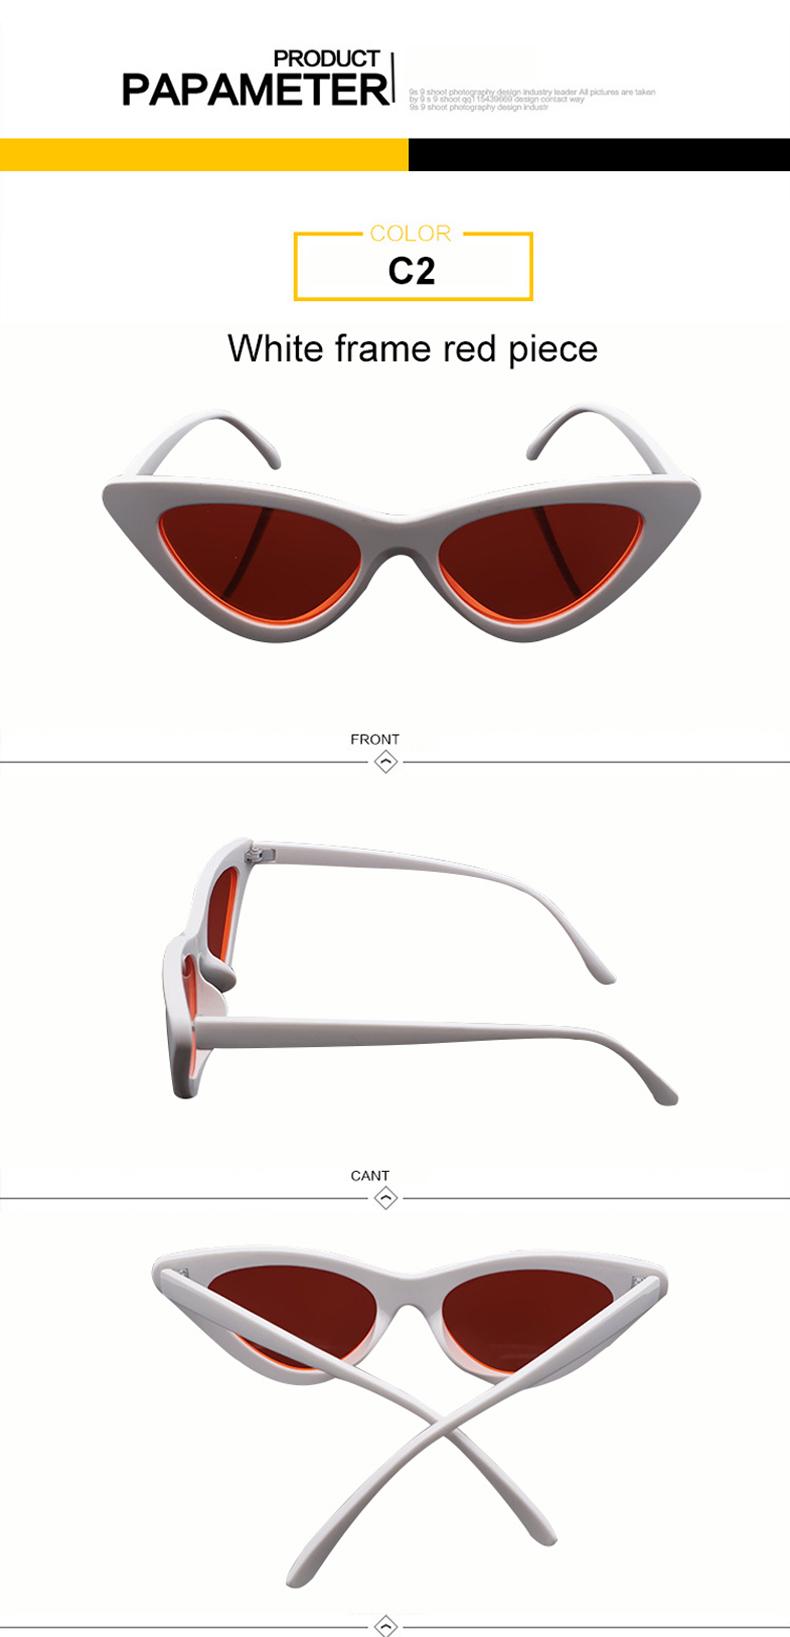 HTB1Y85KjqagSKJjy0Fgq6ARqFXa8 - WHO CUTIE 2018 Brand Designer Black Cat Eye Sunglasses Women Cool Small Cateye Frame Sun Glasses Fashion UV400 Shades WG-008